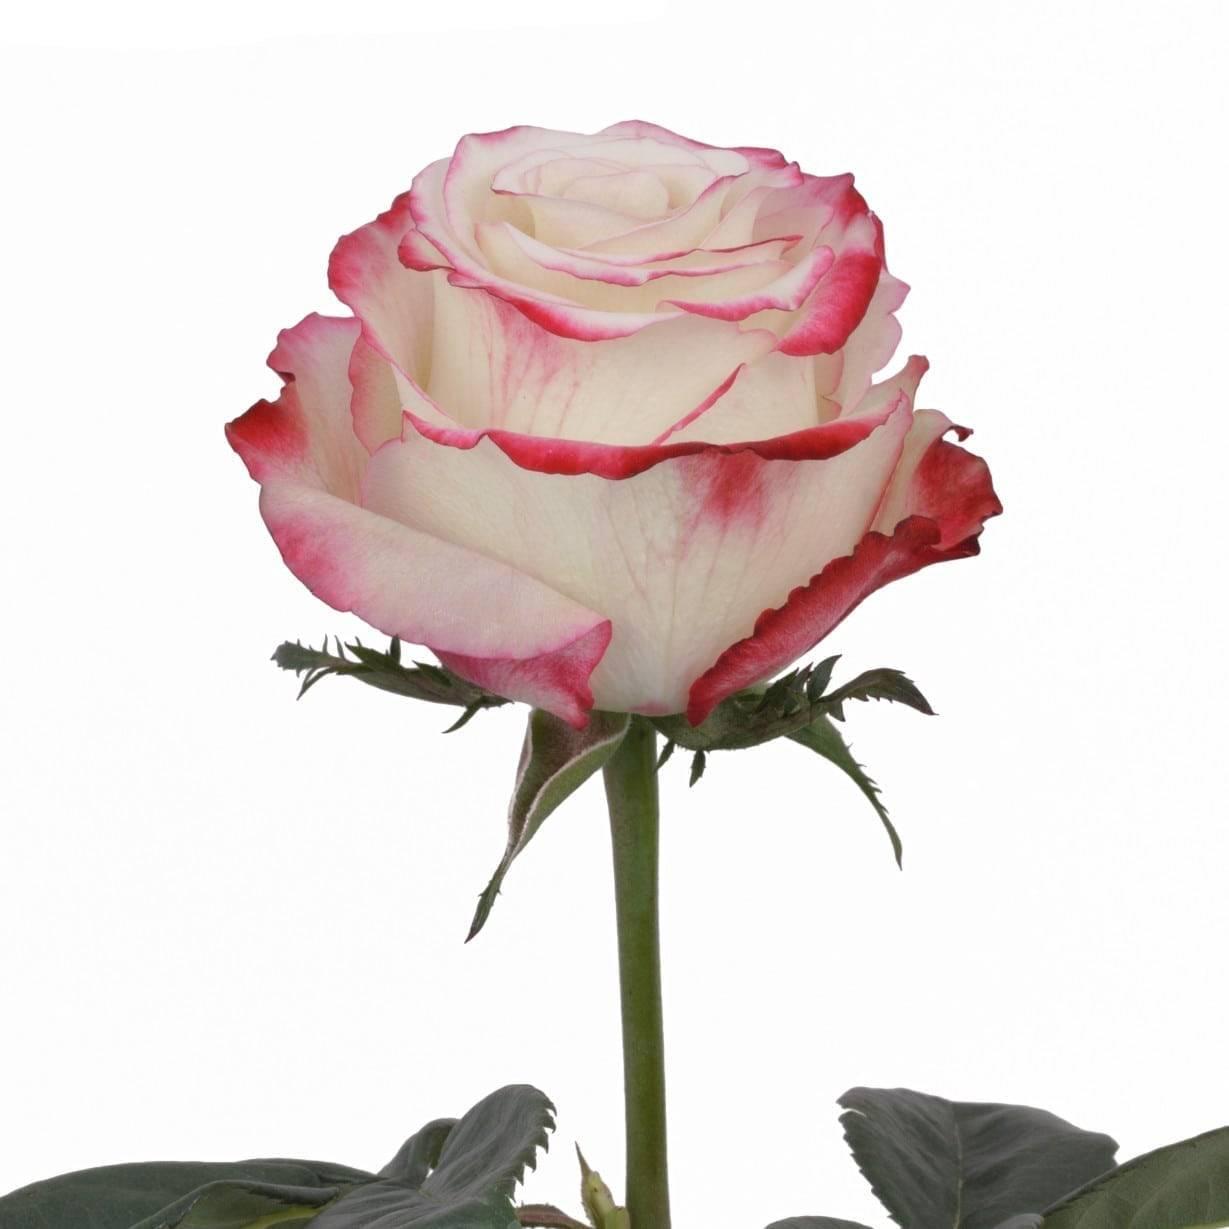 Роза «свитнесс»: описание и фото сорта, сроки и правила посадки, видео